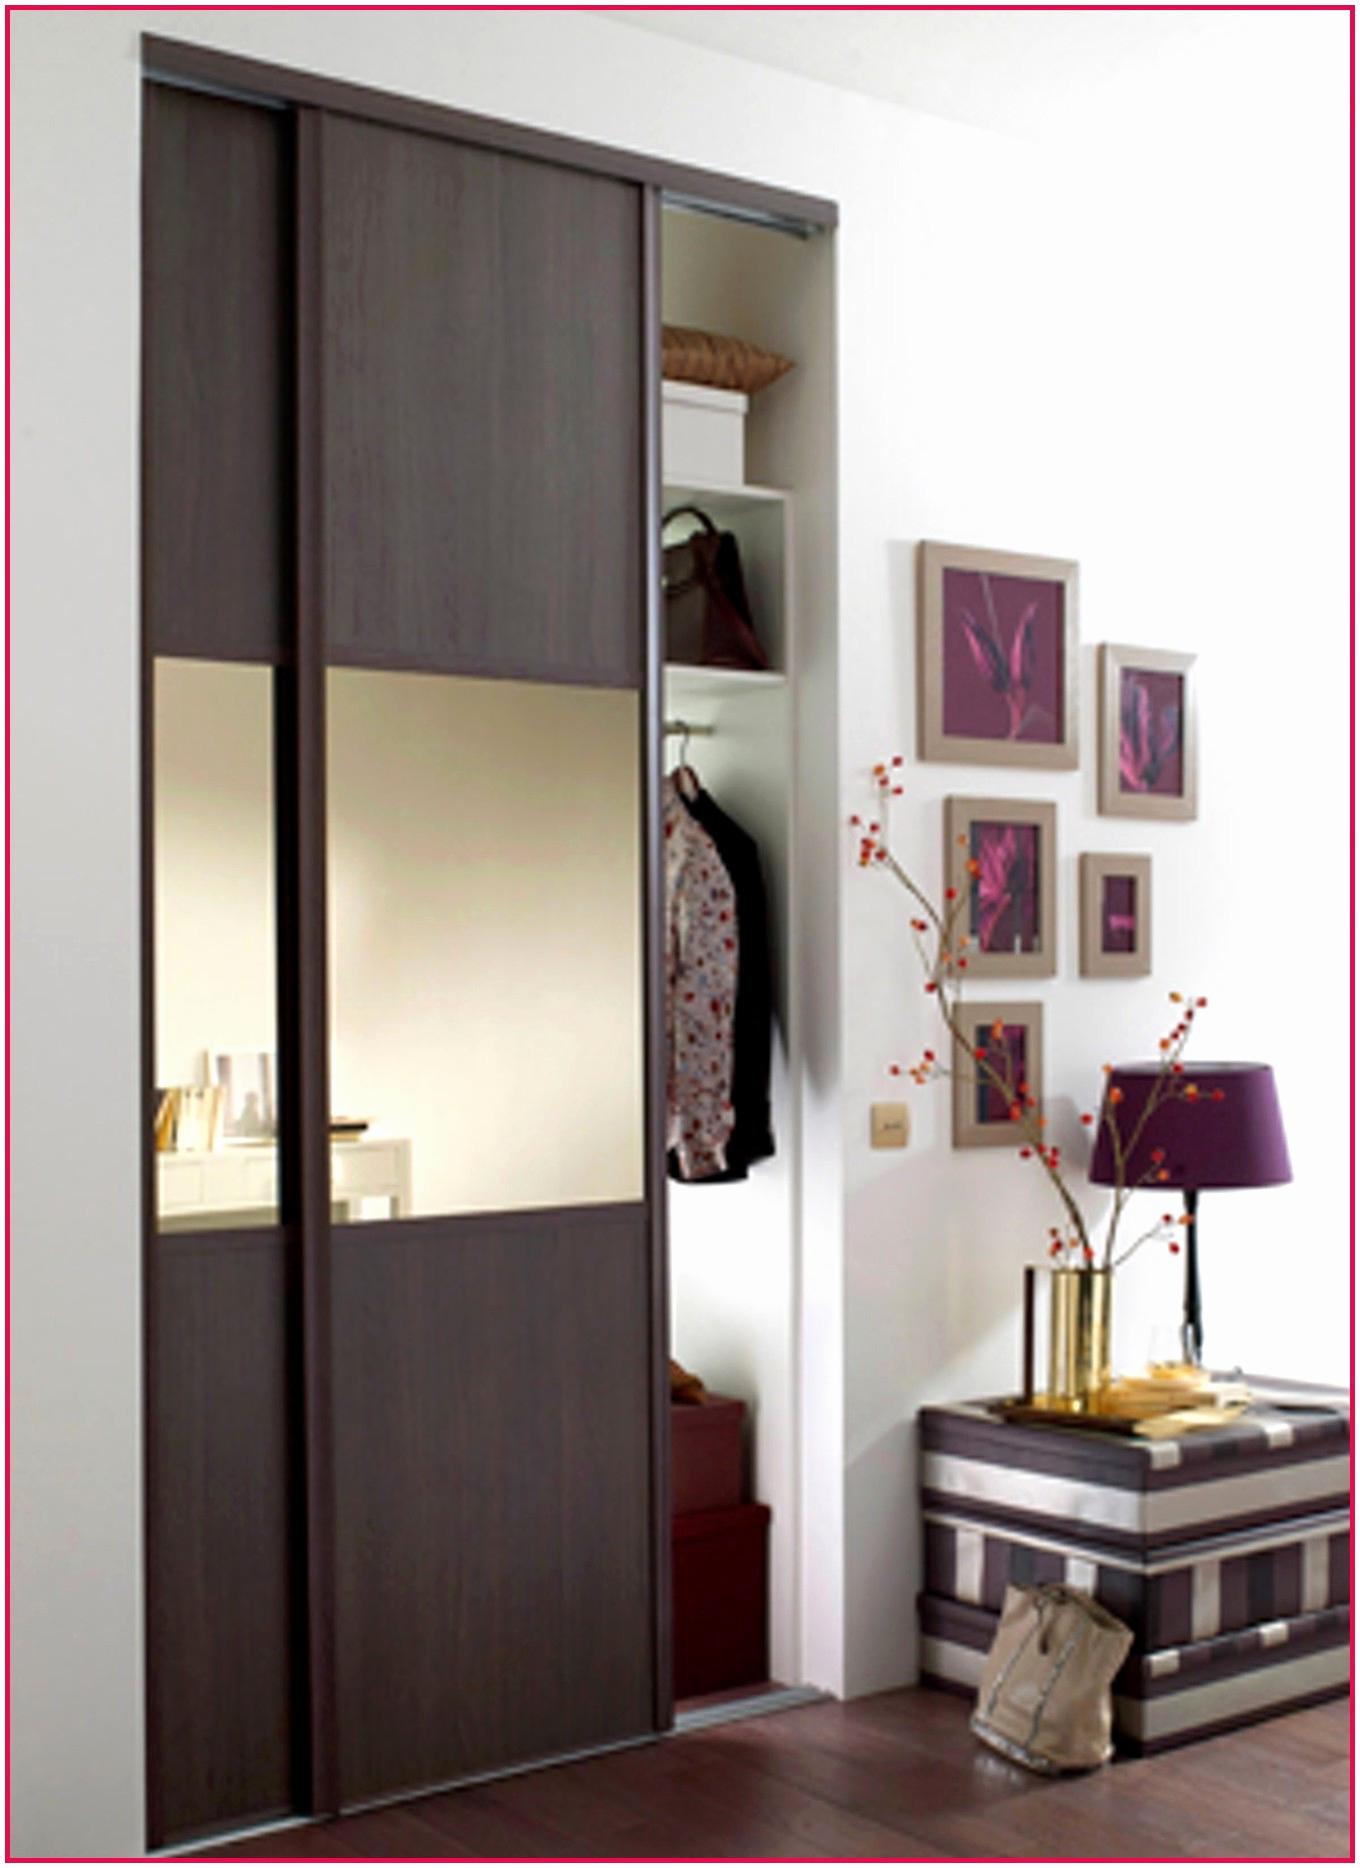 Ikea Miroir Salle De Bains Inspirant Collection Porte Coulissante Salle De Bain Ikea Beau Porte Coulissante De